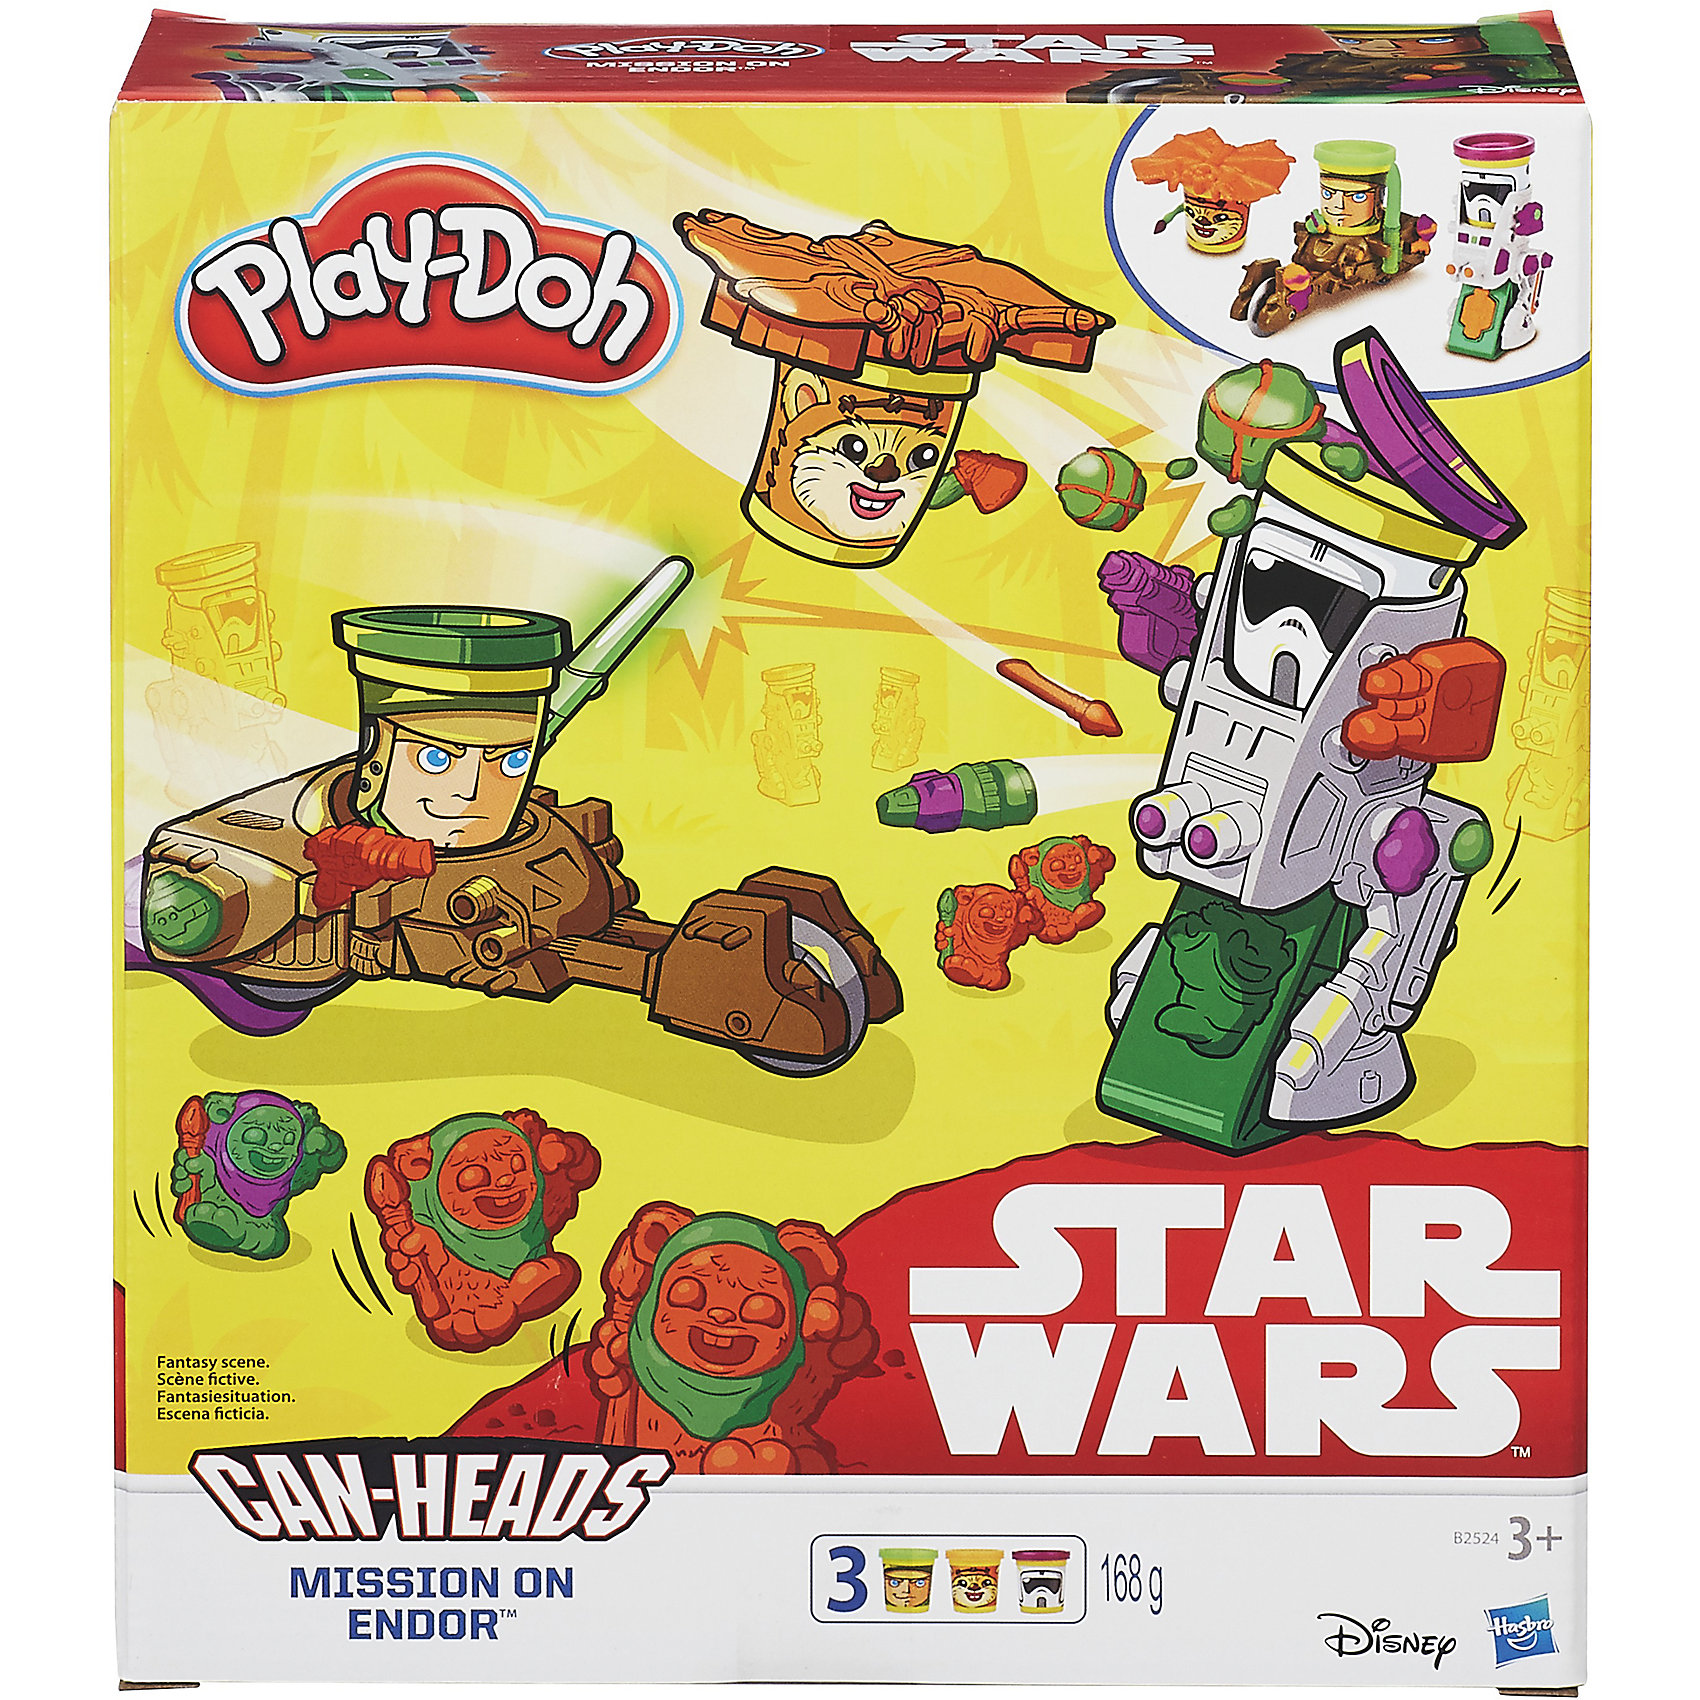 Транспортные средства героев Звездных войн, Play-Doh, var 1 от myToys